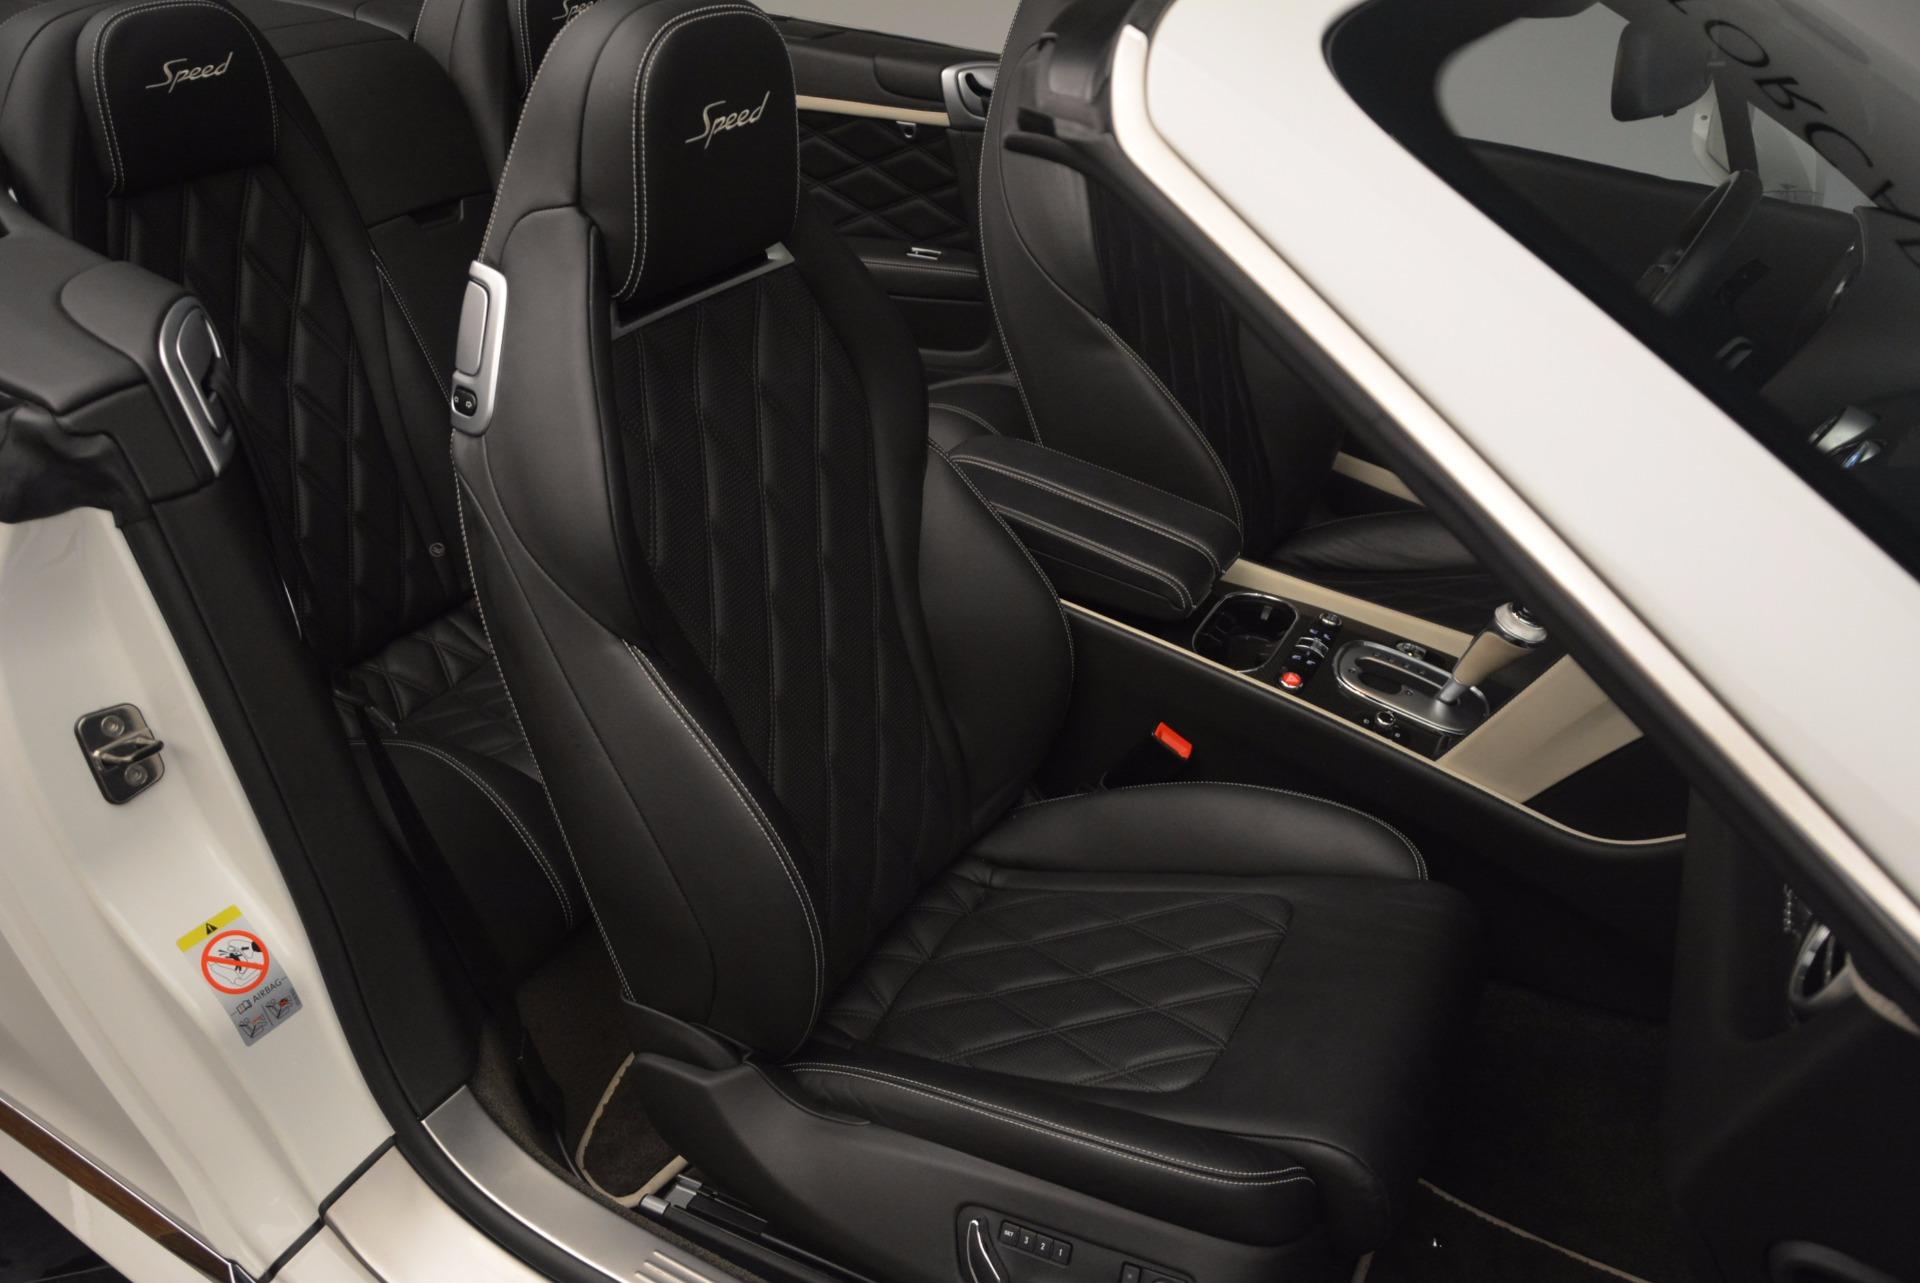 Used 2015 Bentley Continental GT Speed For Sale In Westport, CT 1714_p46